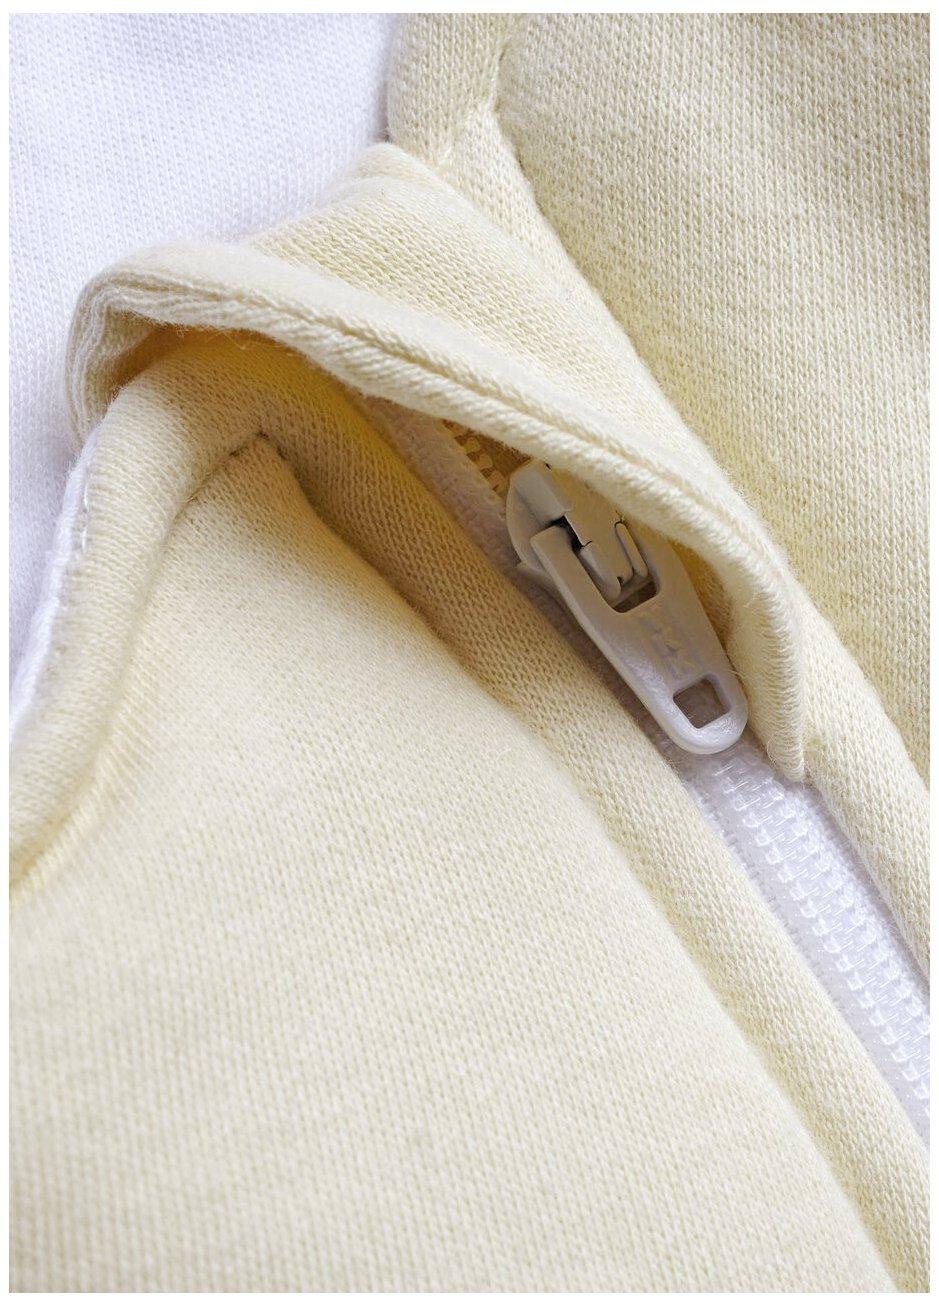 Baby Merlin's Magic Sleepsuit 3-6 months - Cream Cotton Baby Merlin Company MSSC-CSP